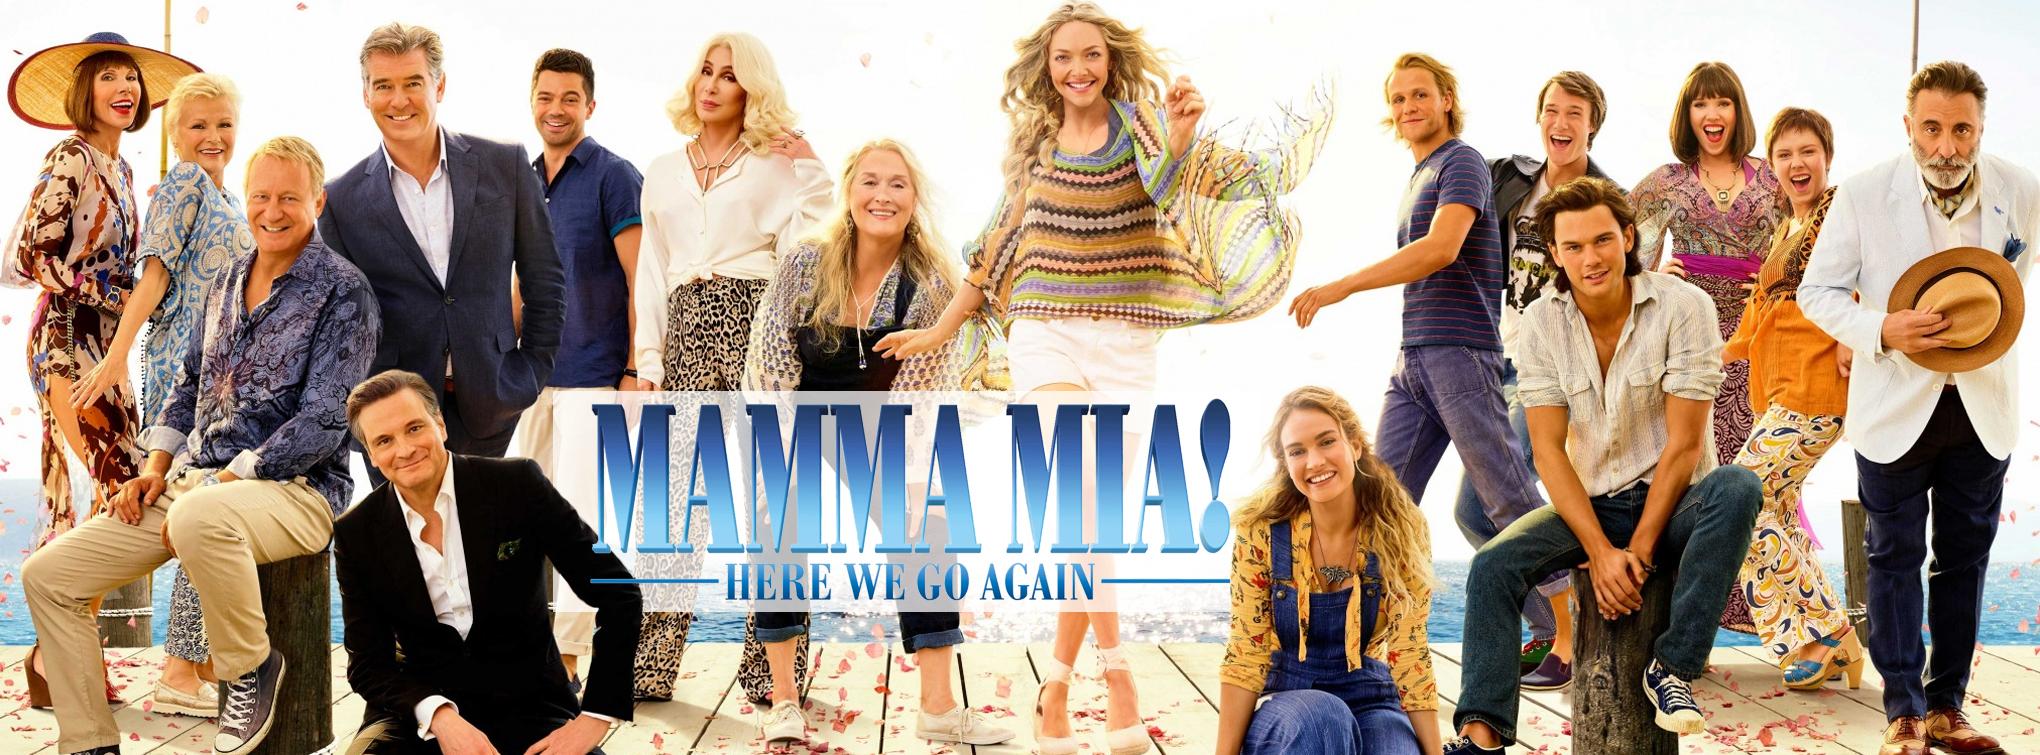 Slider image for Mamma Mia! Here We Go Again